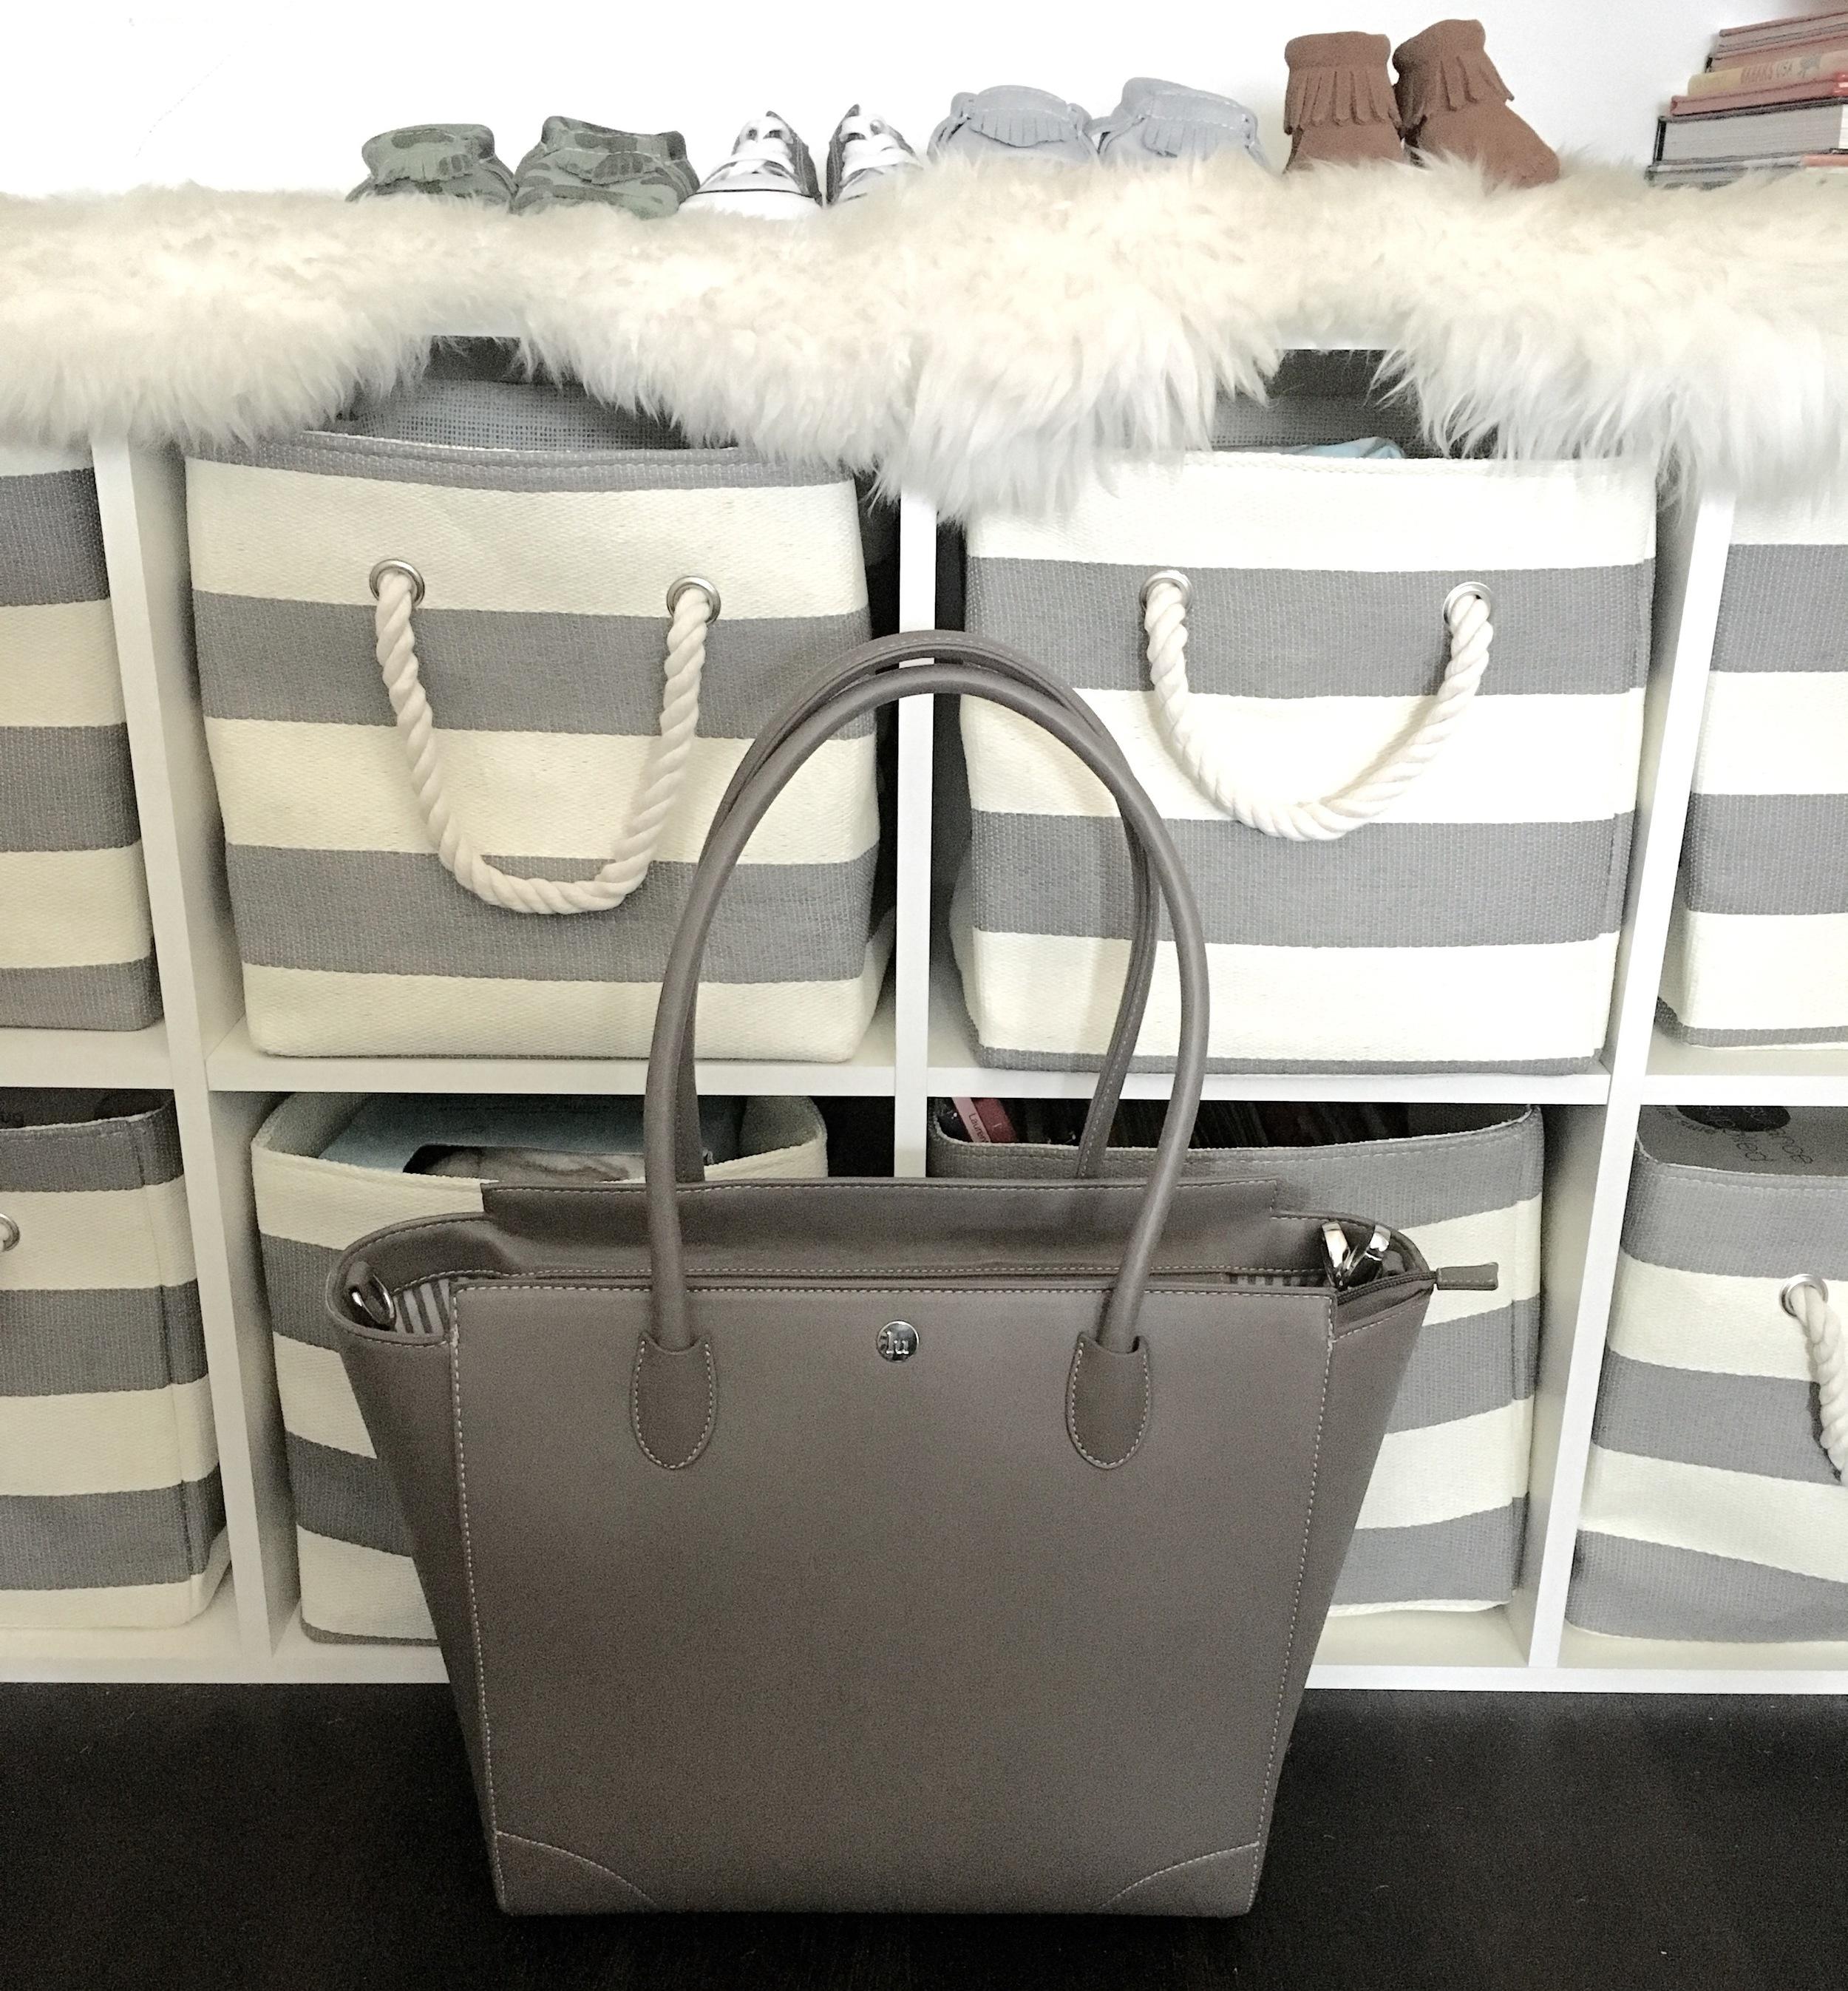 Storage baskets:  Land of Nod ; Diaper bag:  Little Unicorn